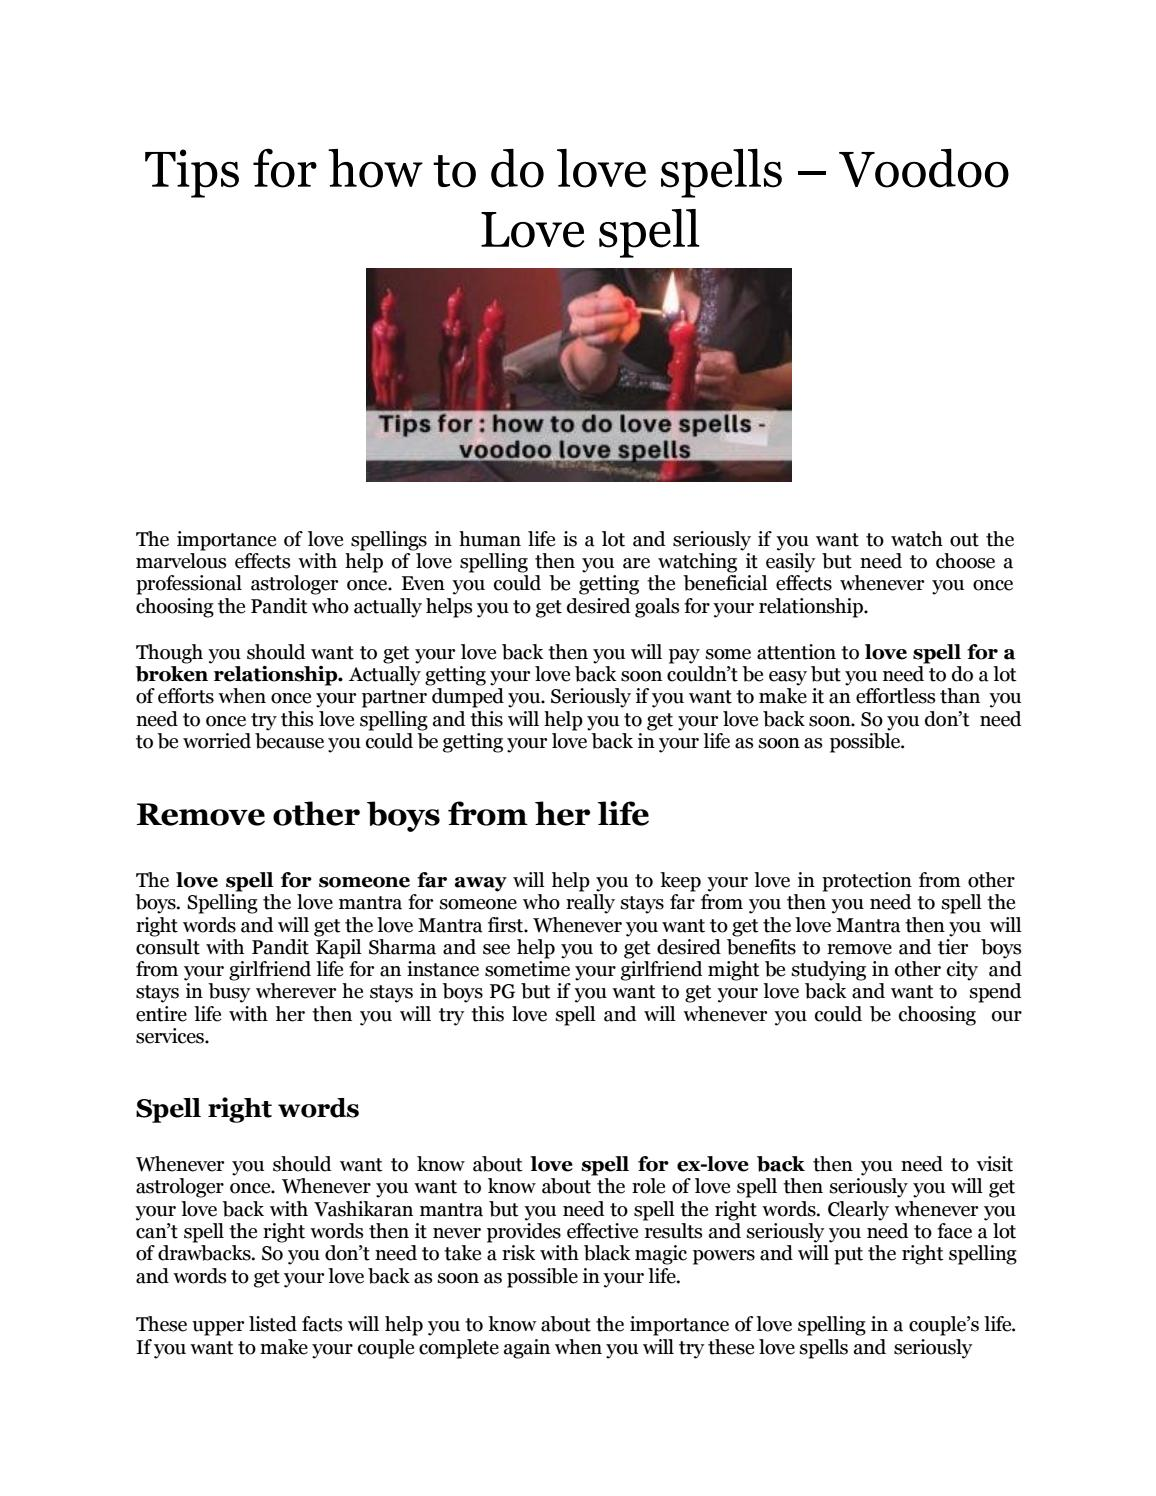 Tips for how to do love spells - voodoo love spells by kksharma - issuu